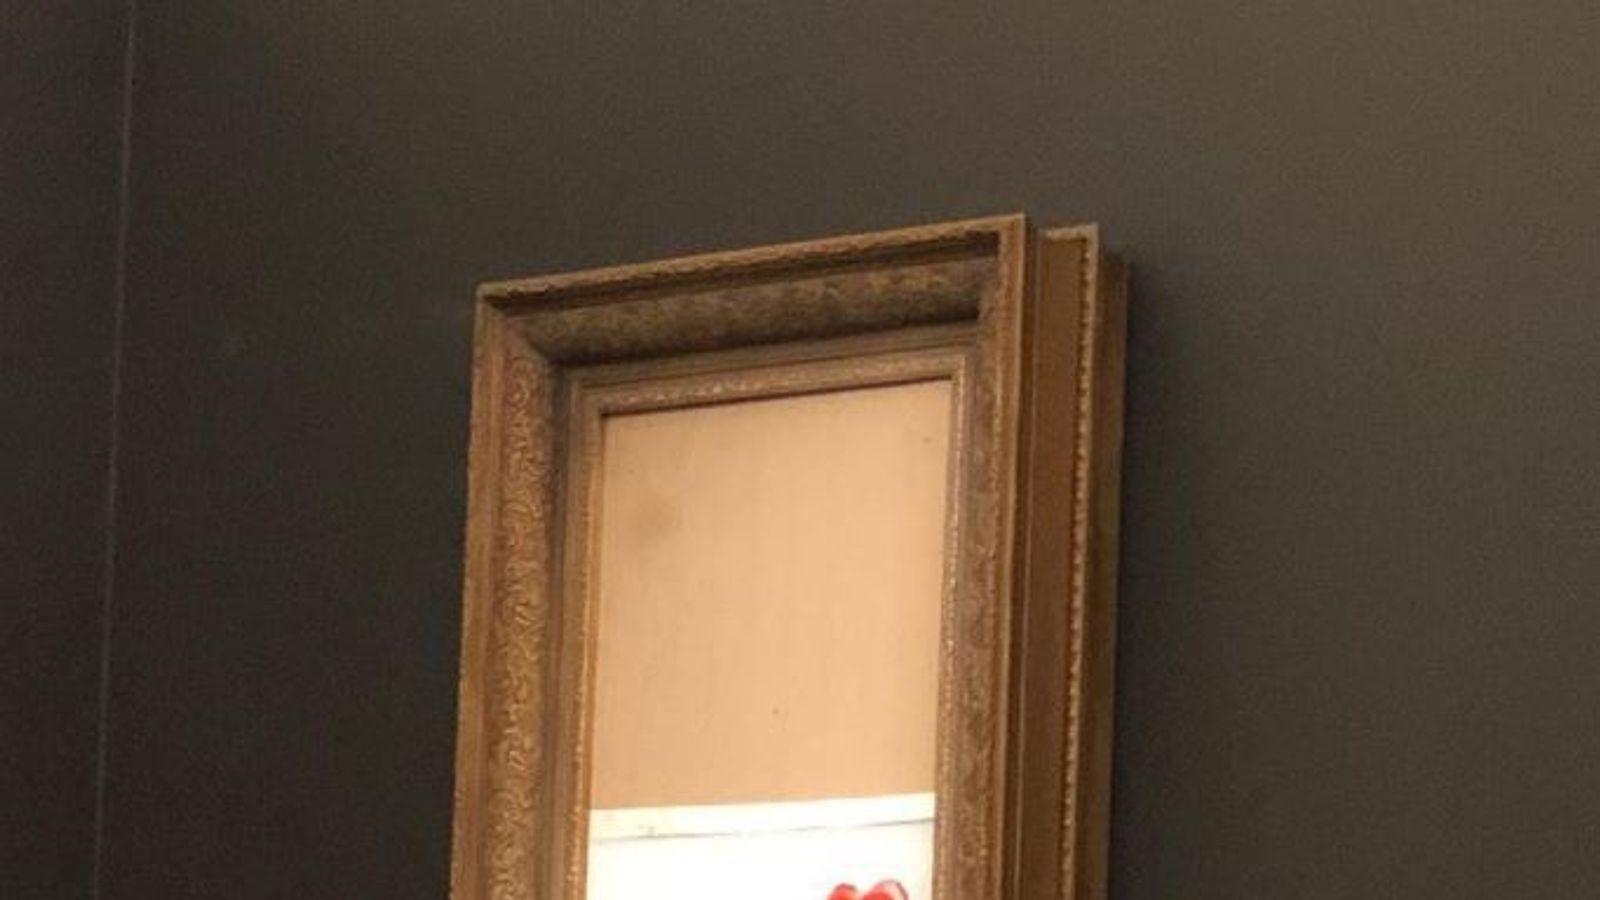 Banksy painting 'self-destructs' after £1m sale